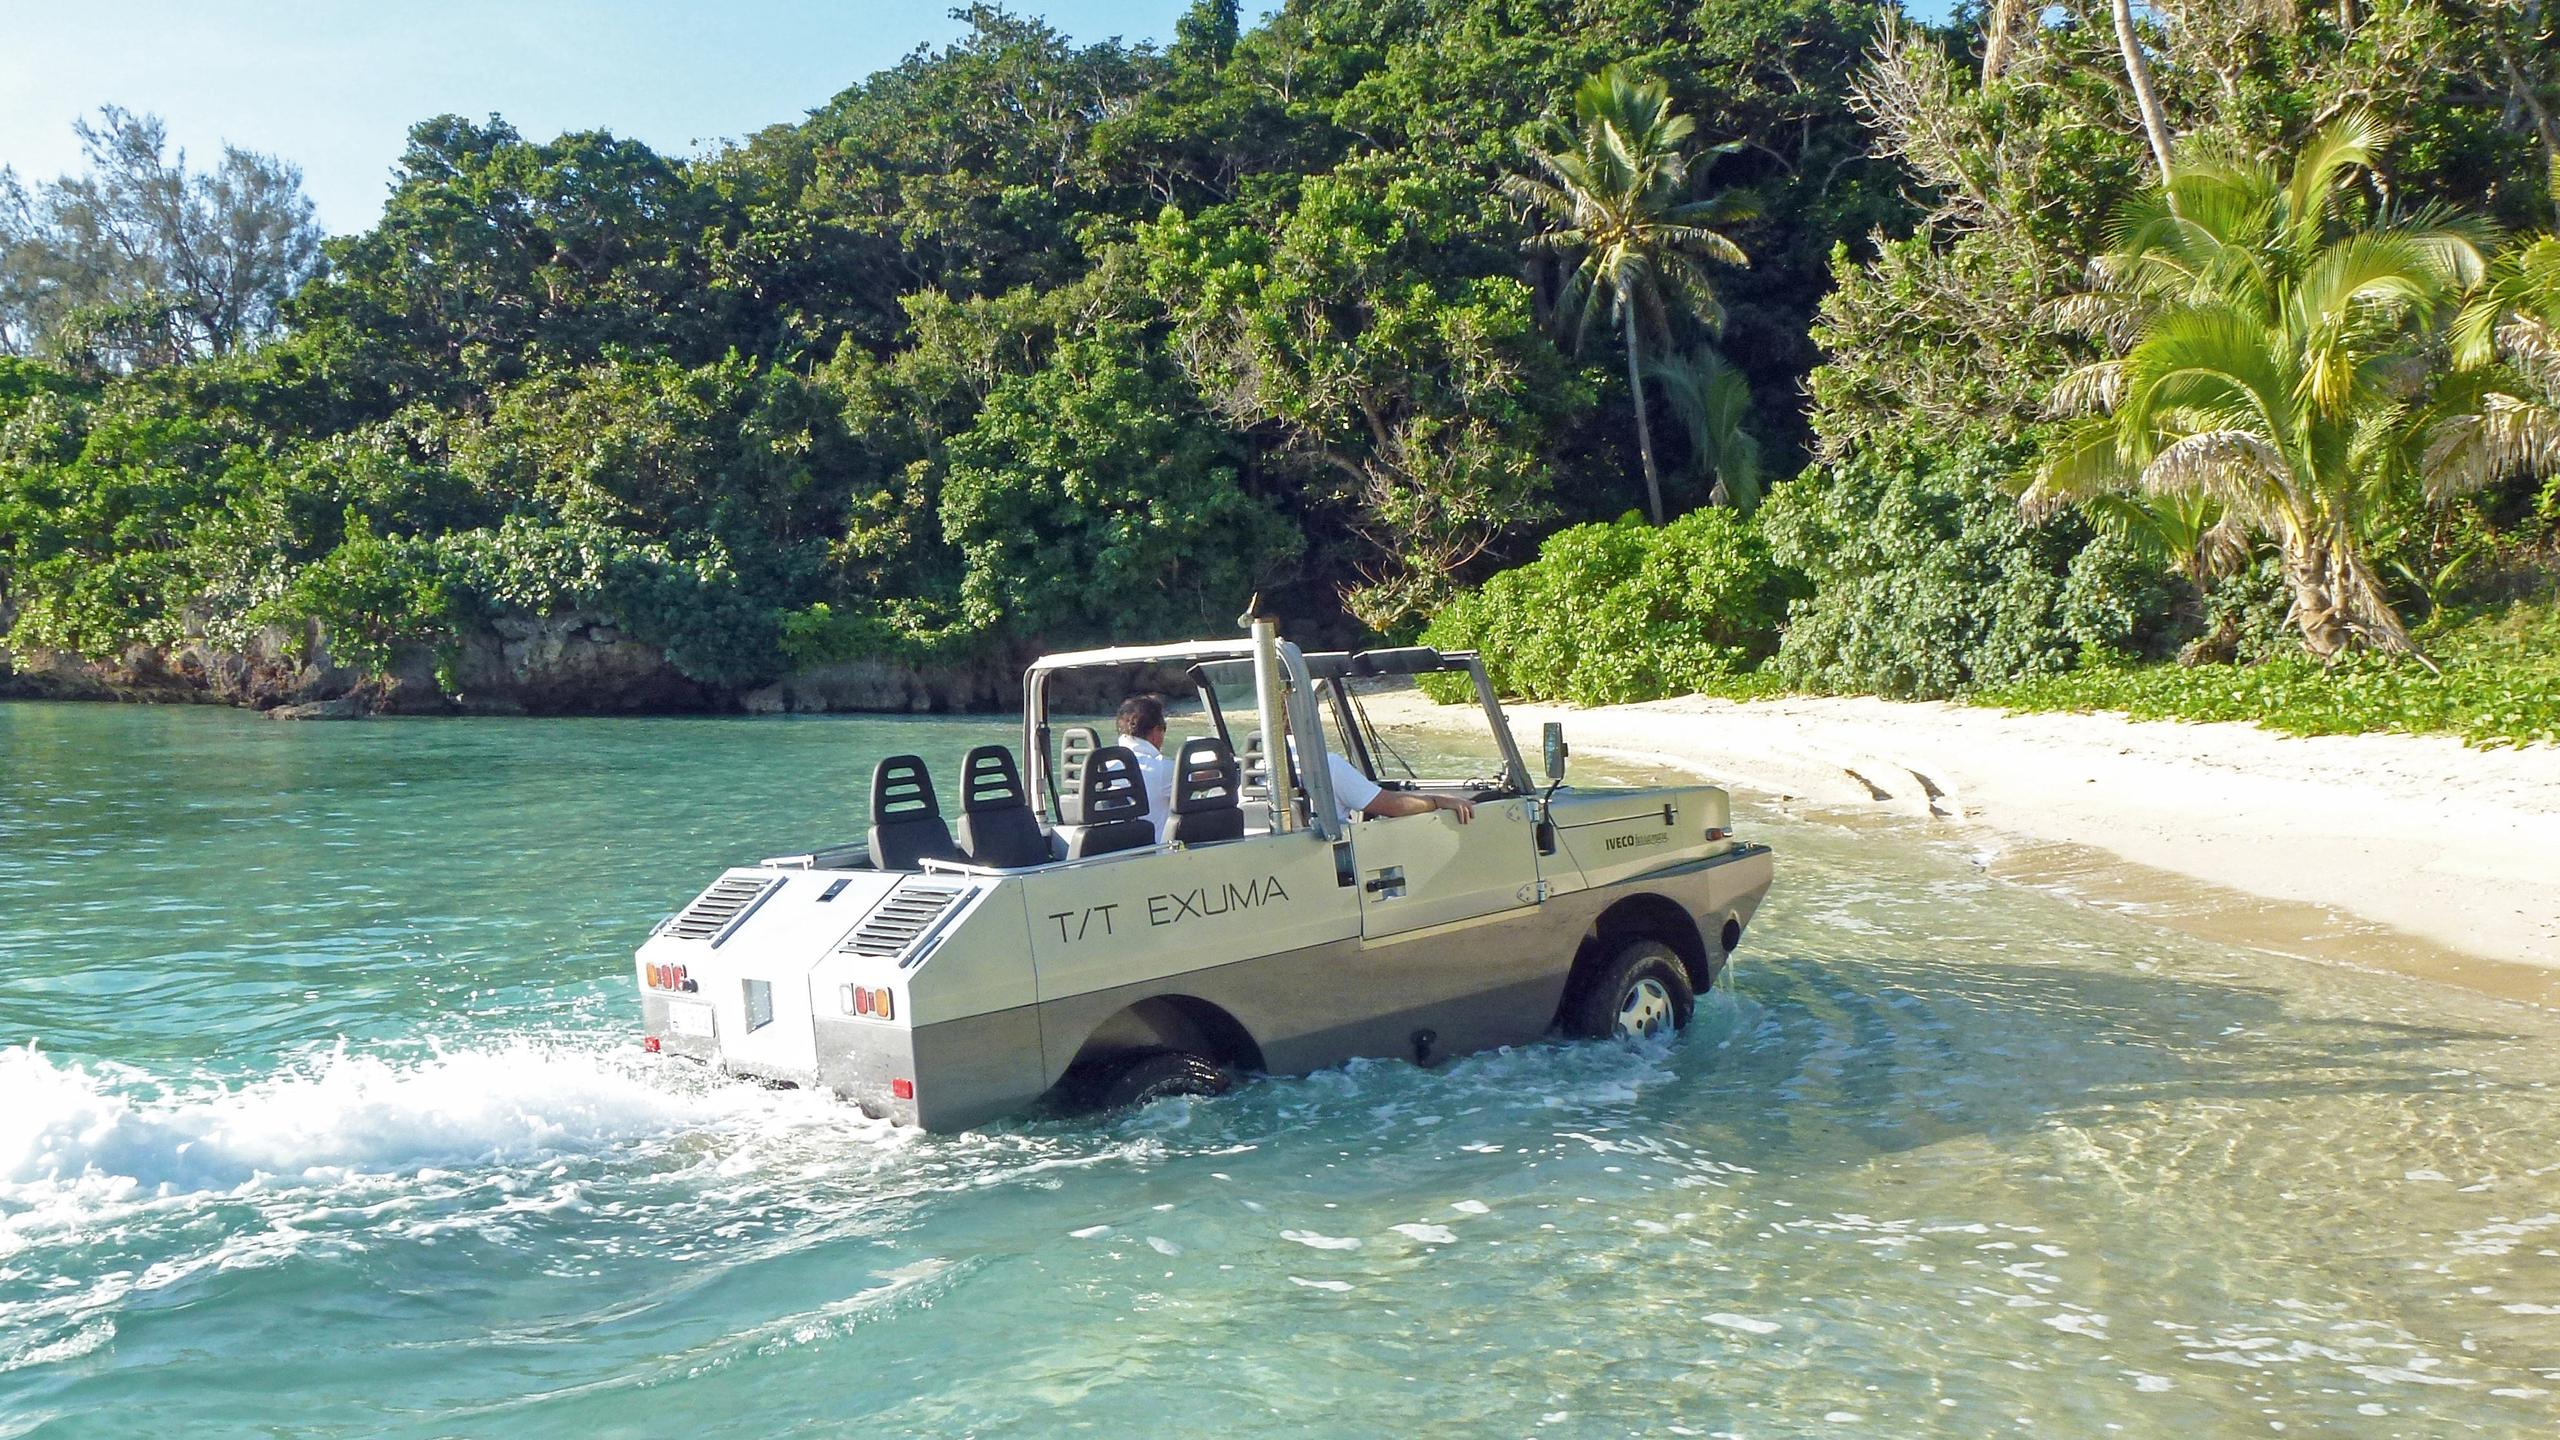 exuma-motor-yacht-perini-navi-picchiotti-2010-50m-jeep-beach